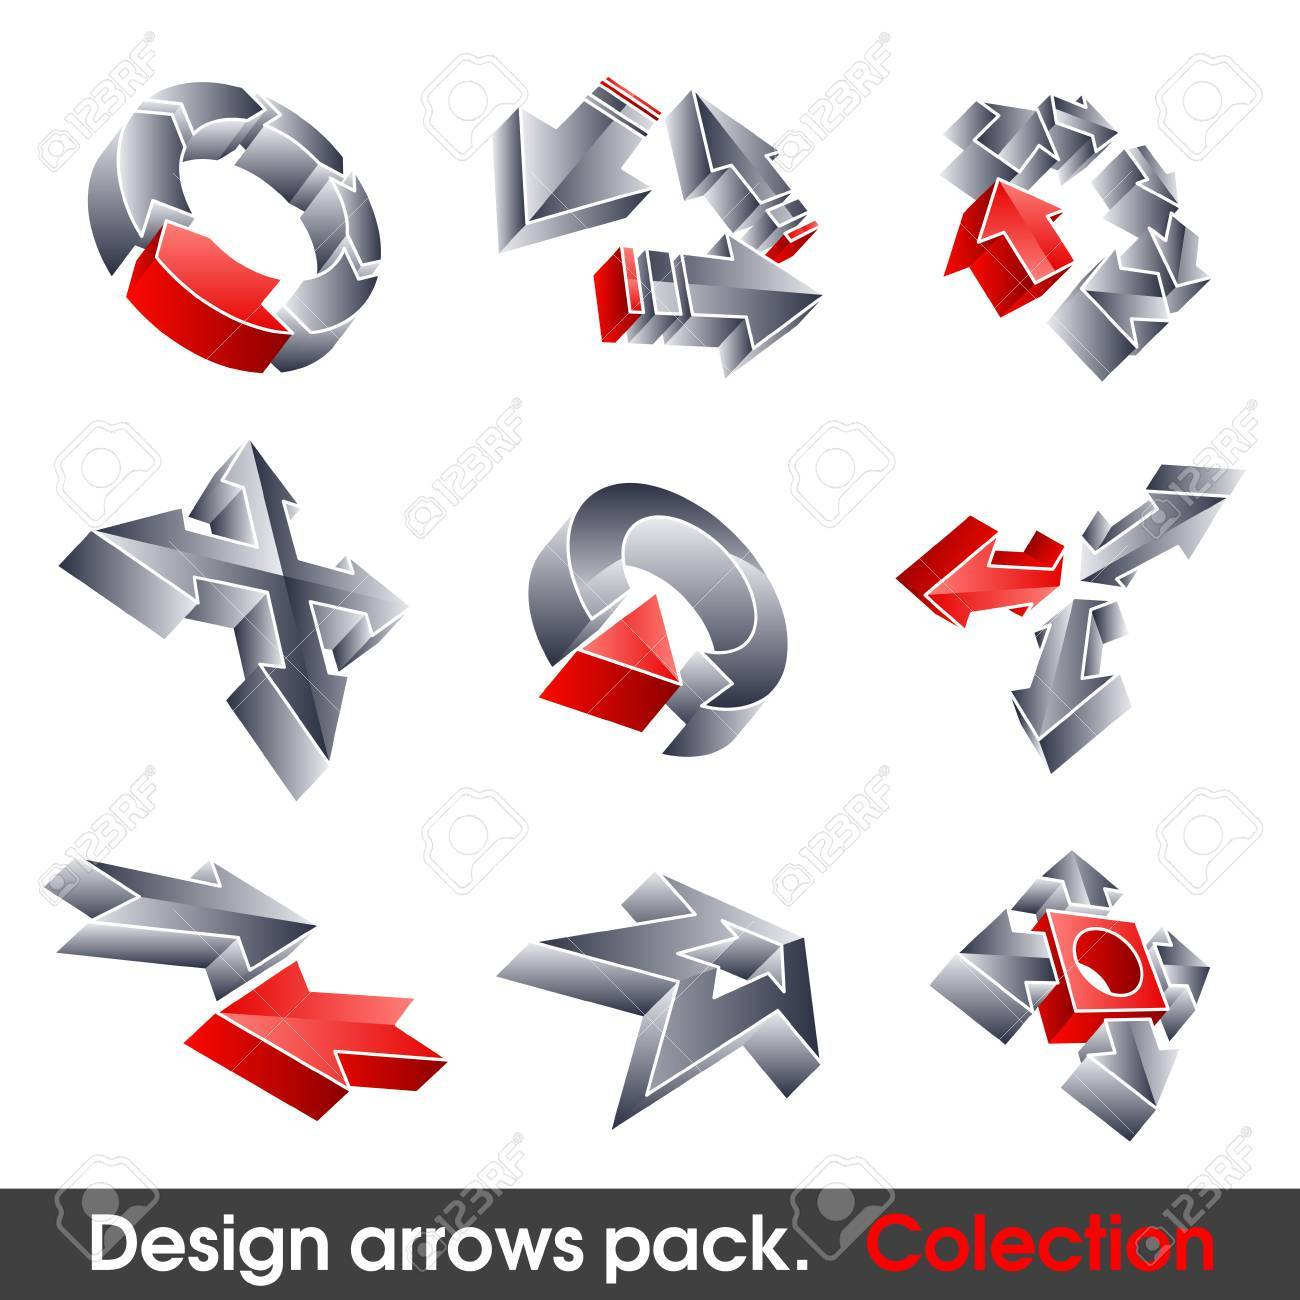 Vector arrows. Design elements. 3D symbol for your artwork. Stock Vector - 7910440